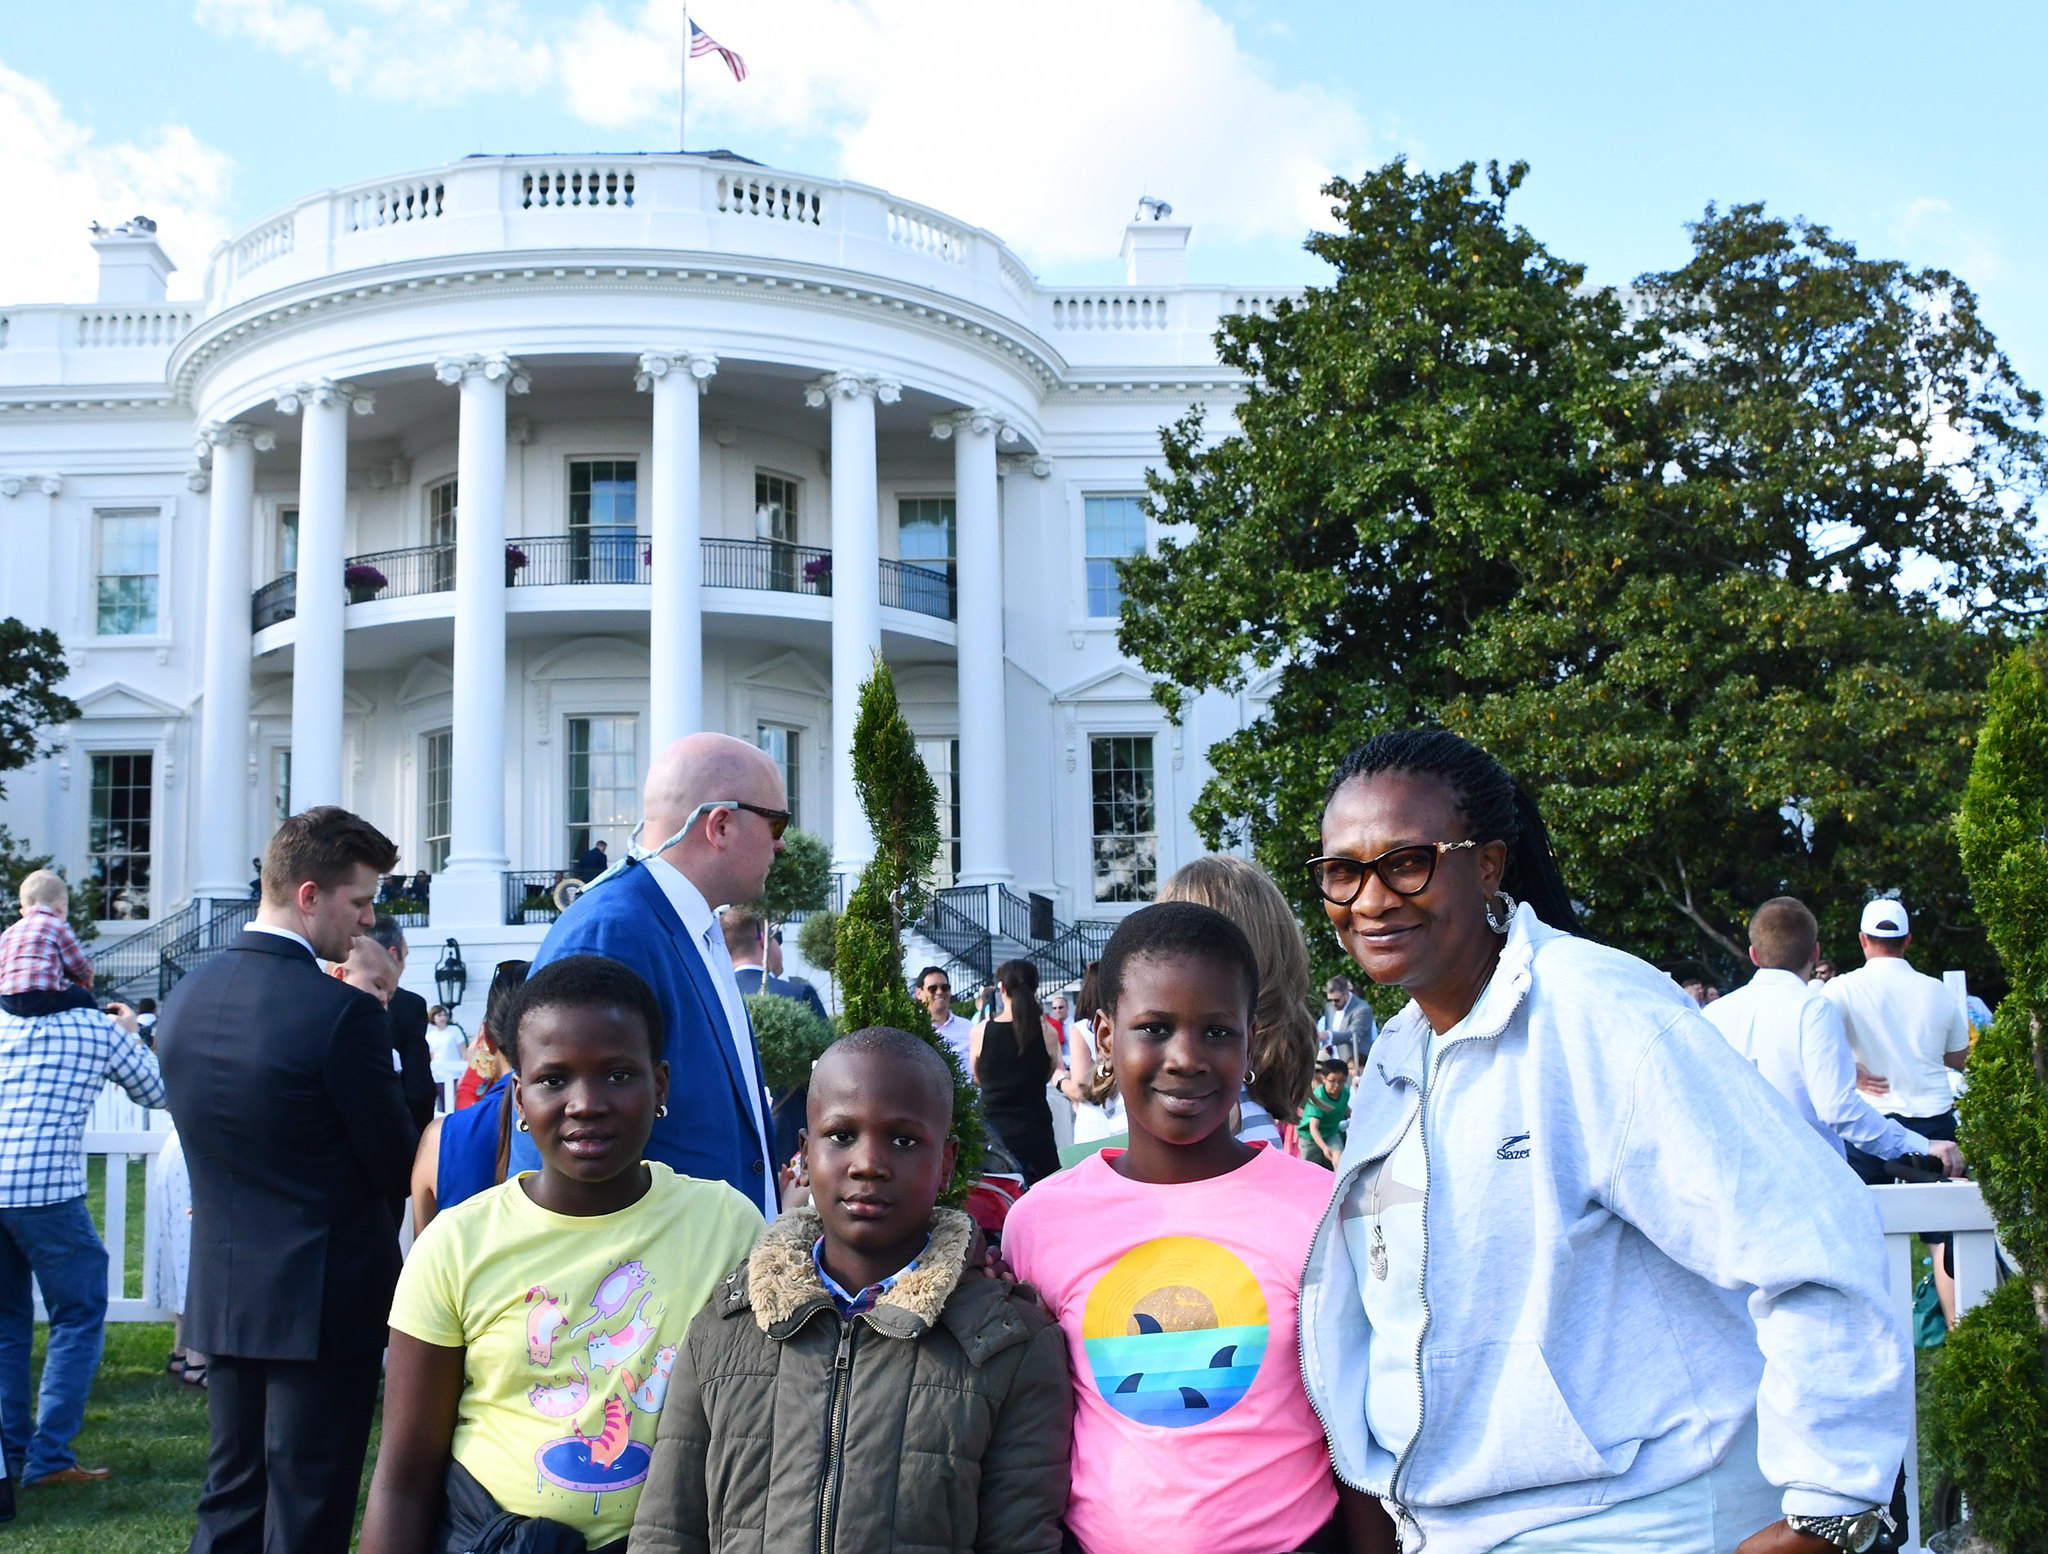 Inn residents at the White House for the annual Easter Egg Roll